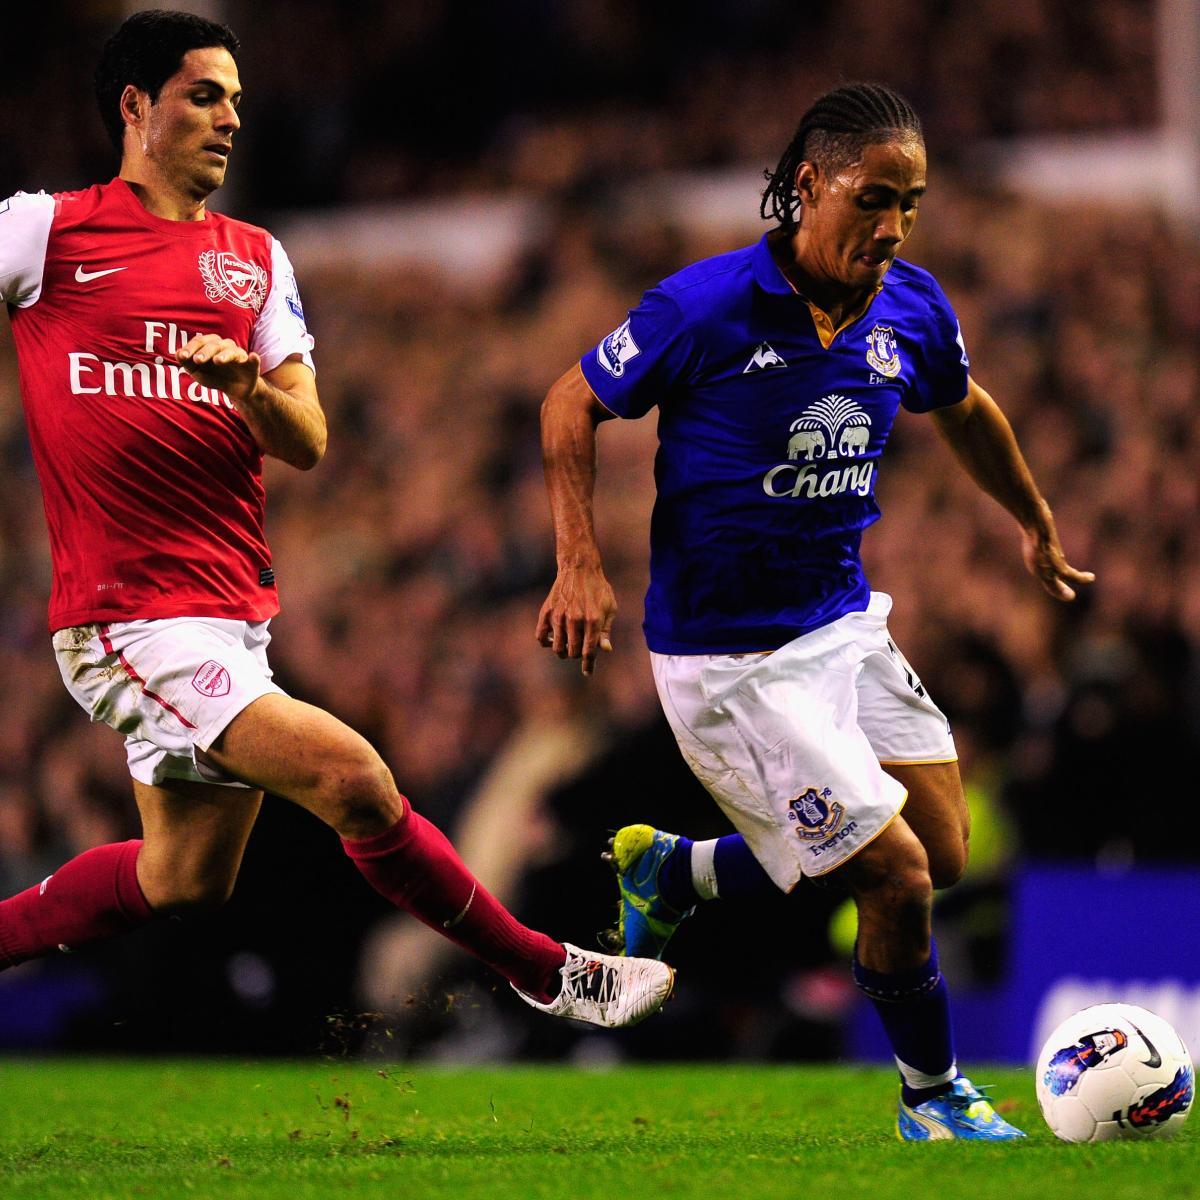 Arsenal Vs Tottenham Live Score Highlights From Premier: Everton Vs. Arsenal: Premier League Live Score, Highlights